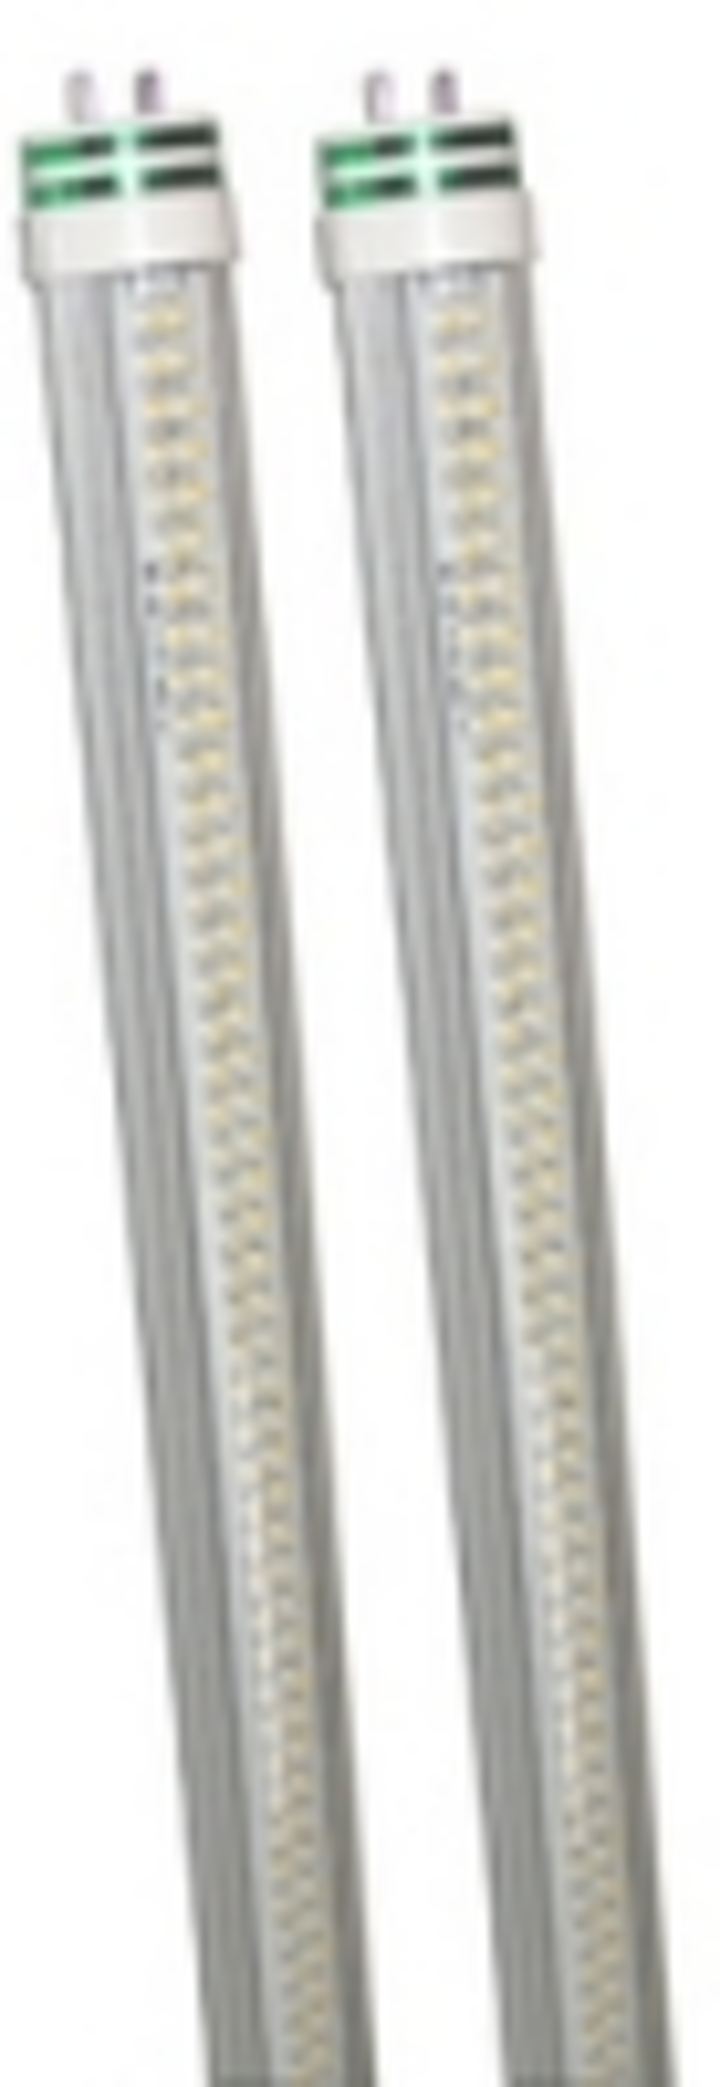 Content Dam Leds En Ugc 2012 11 Polybrite International Releases Designlights Consortium Qualified Borealis T8 Led Lamp Leftcolumn Article Thumbnailimage File